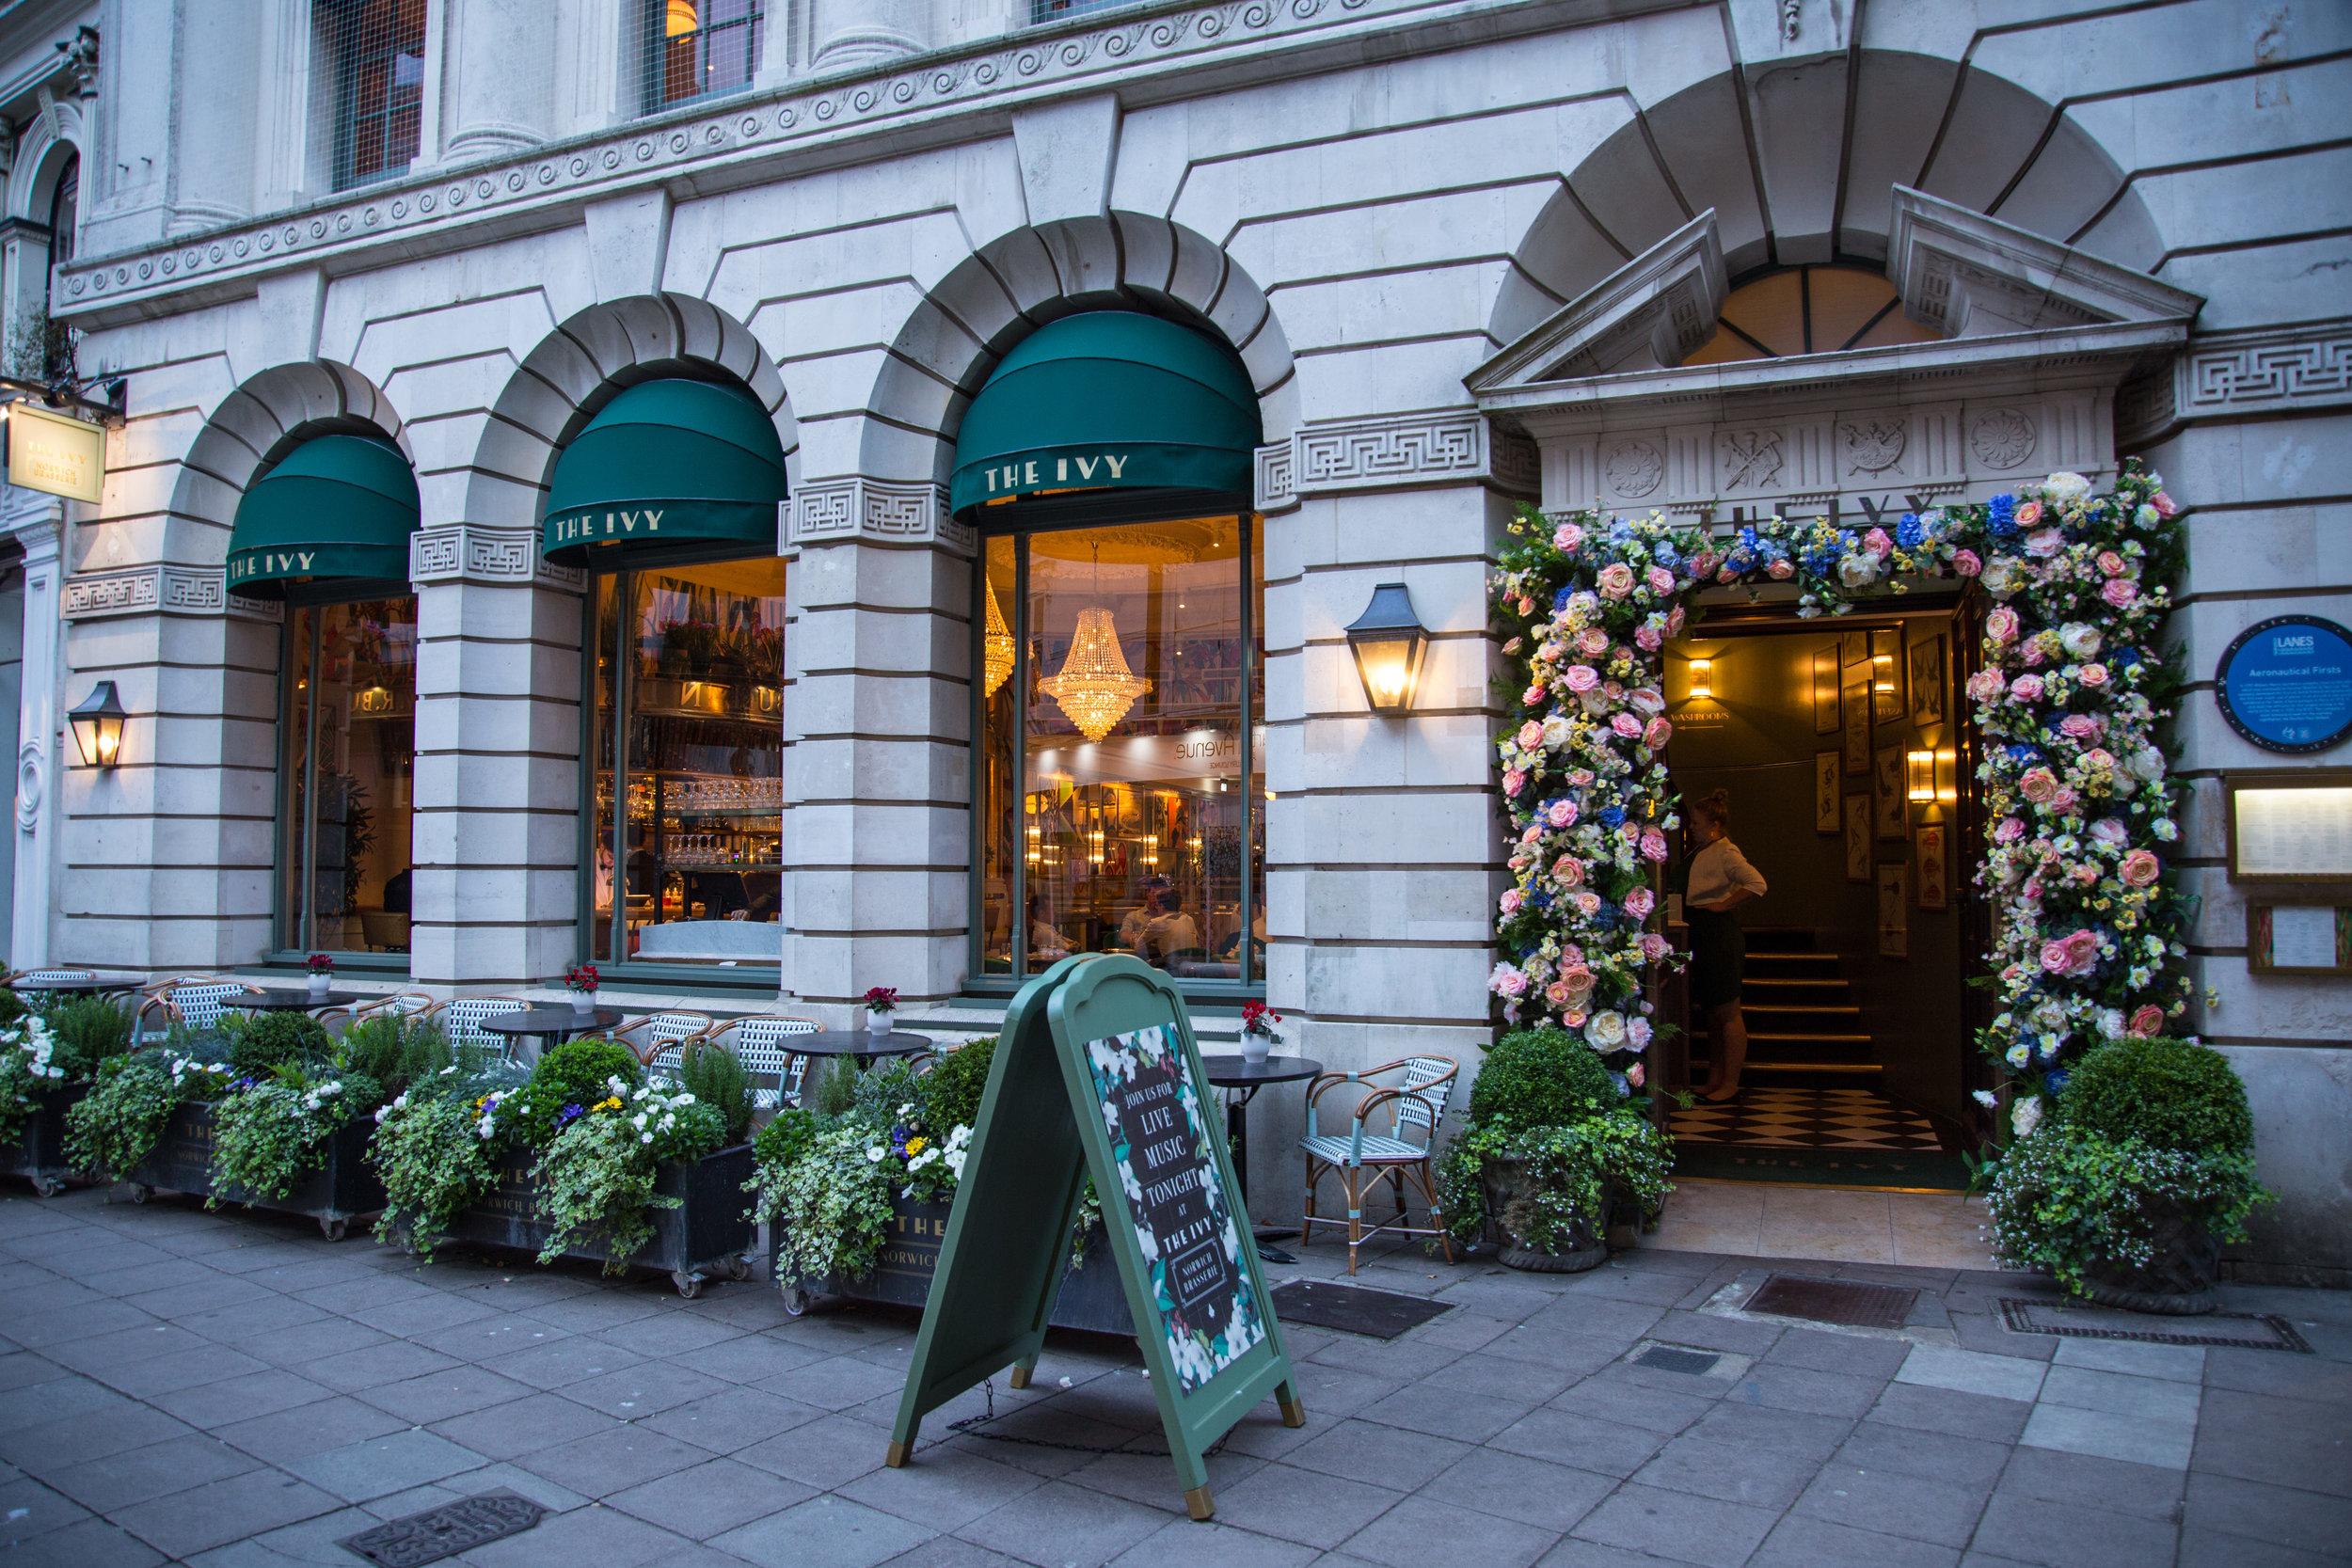 The Ivy Norwich Brasserie